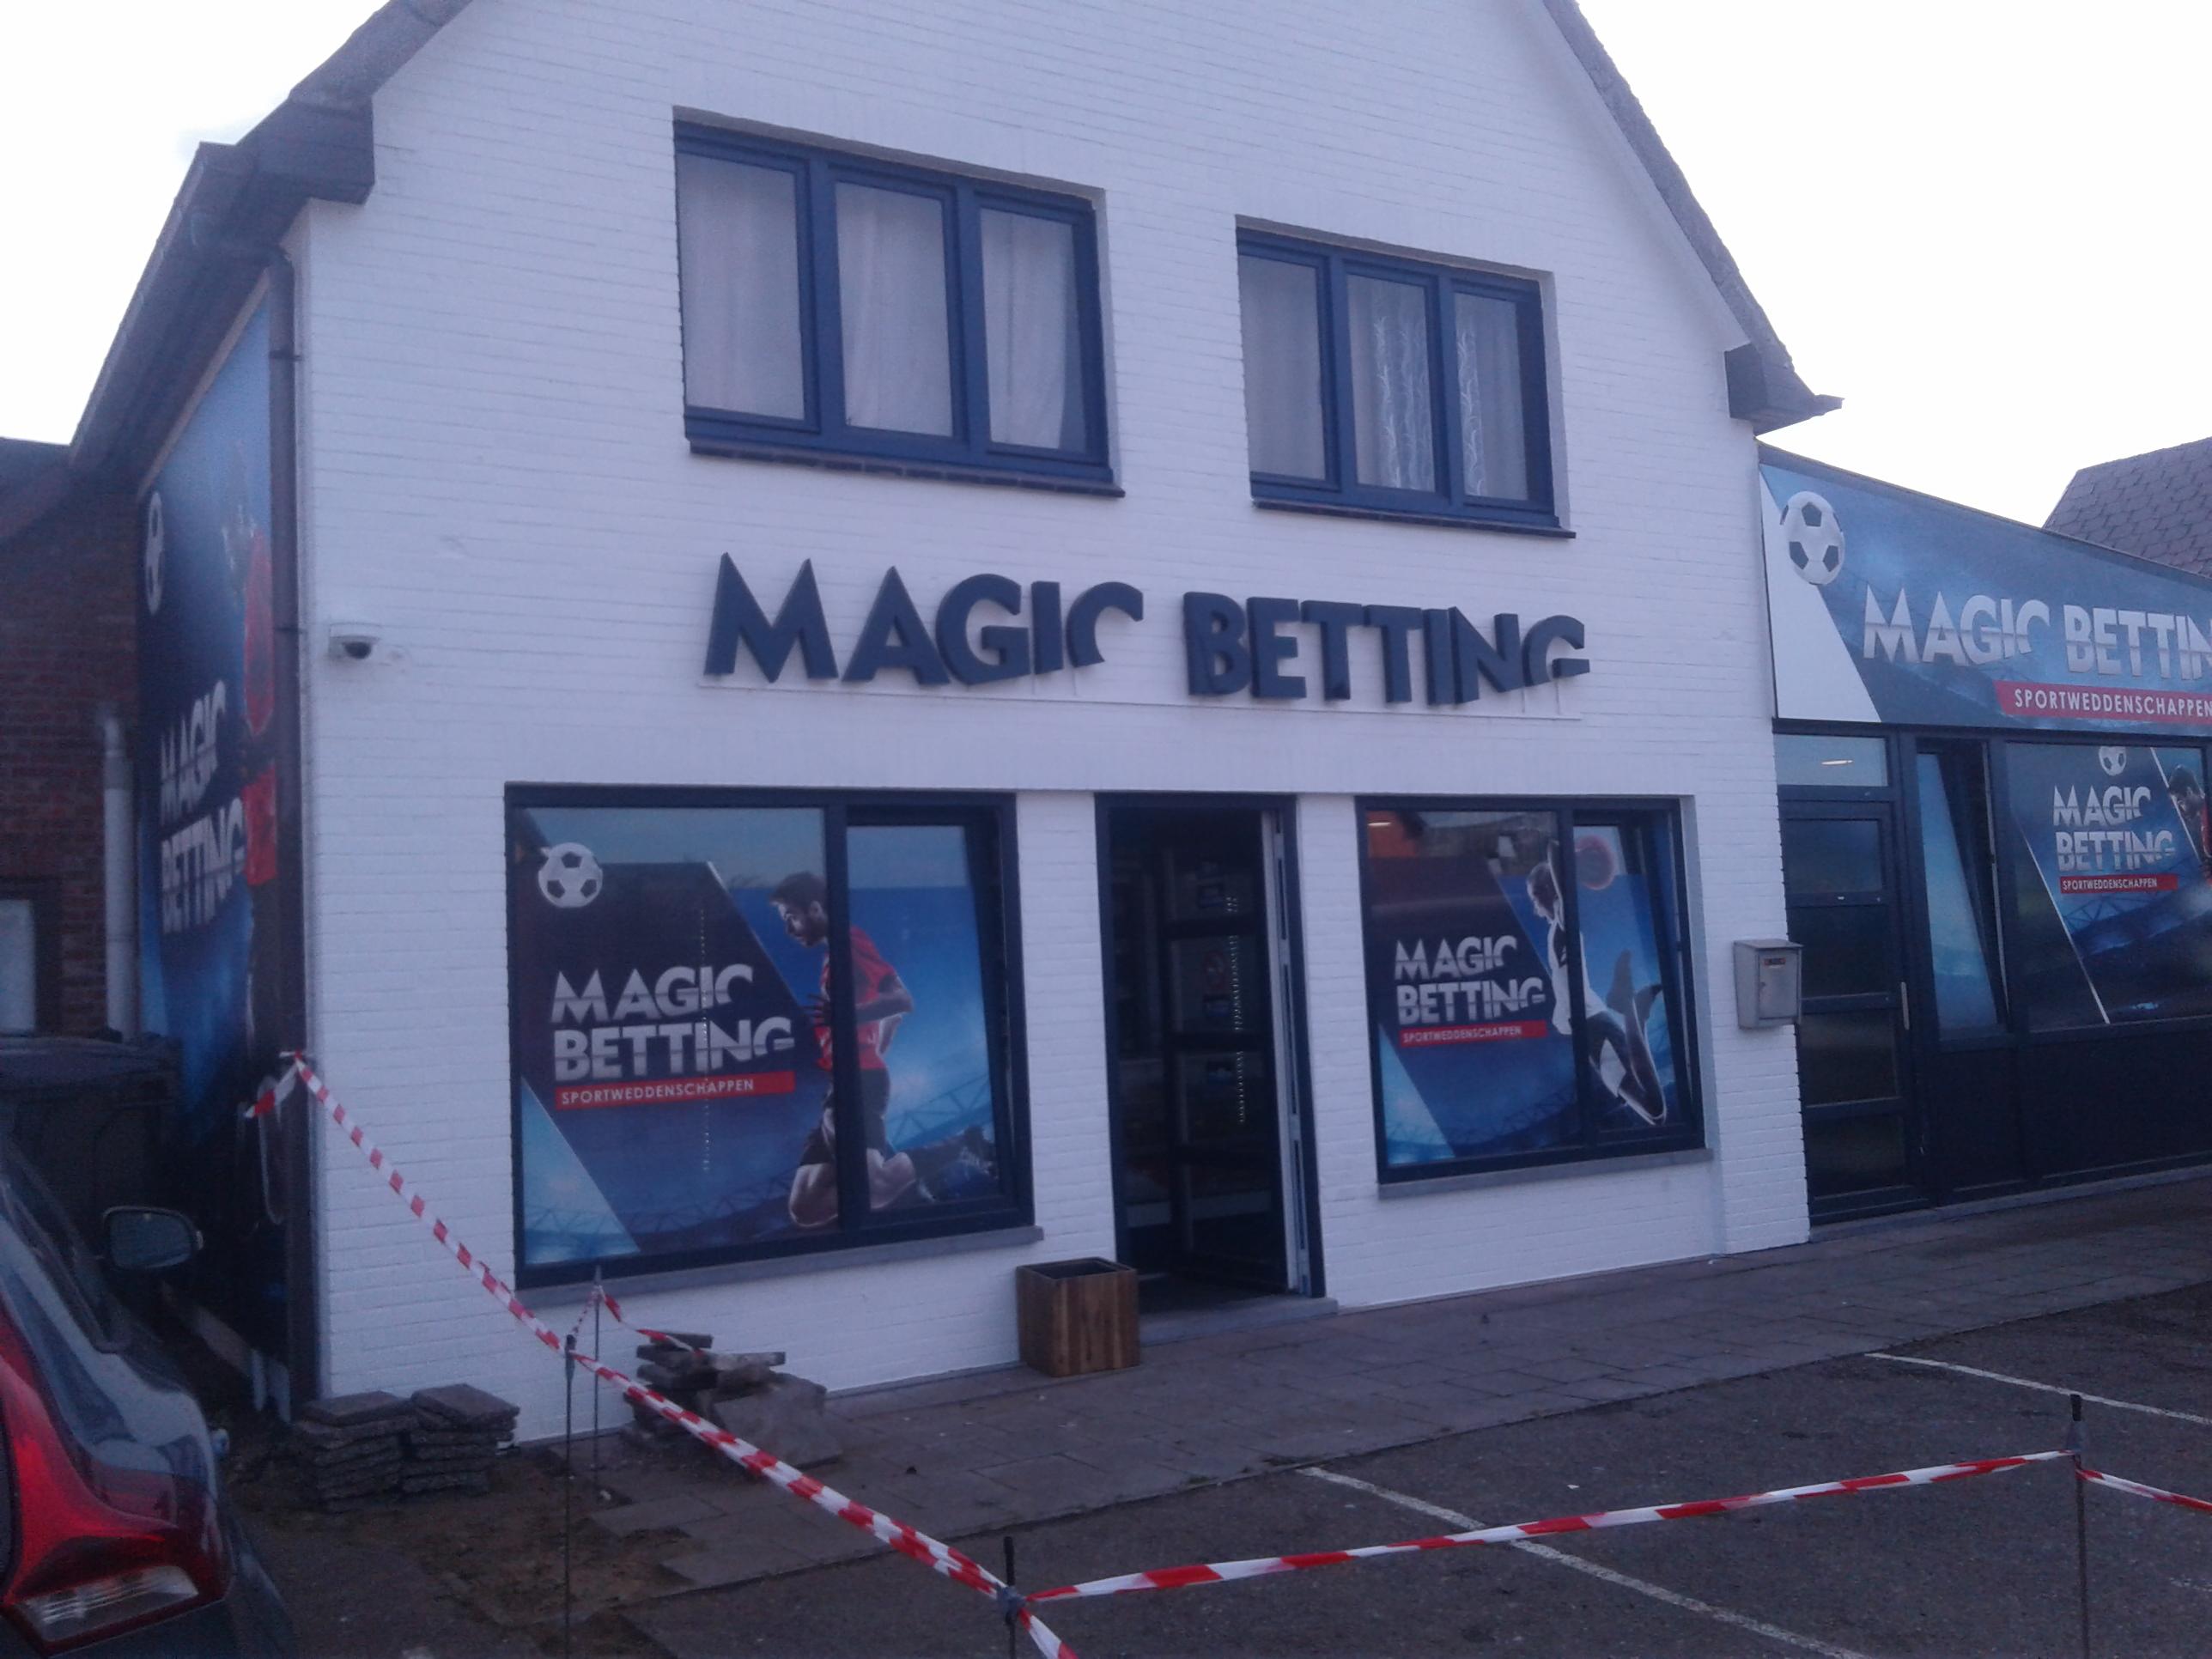 Gevelletters_BettingService